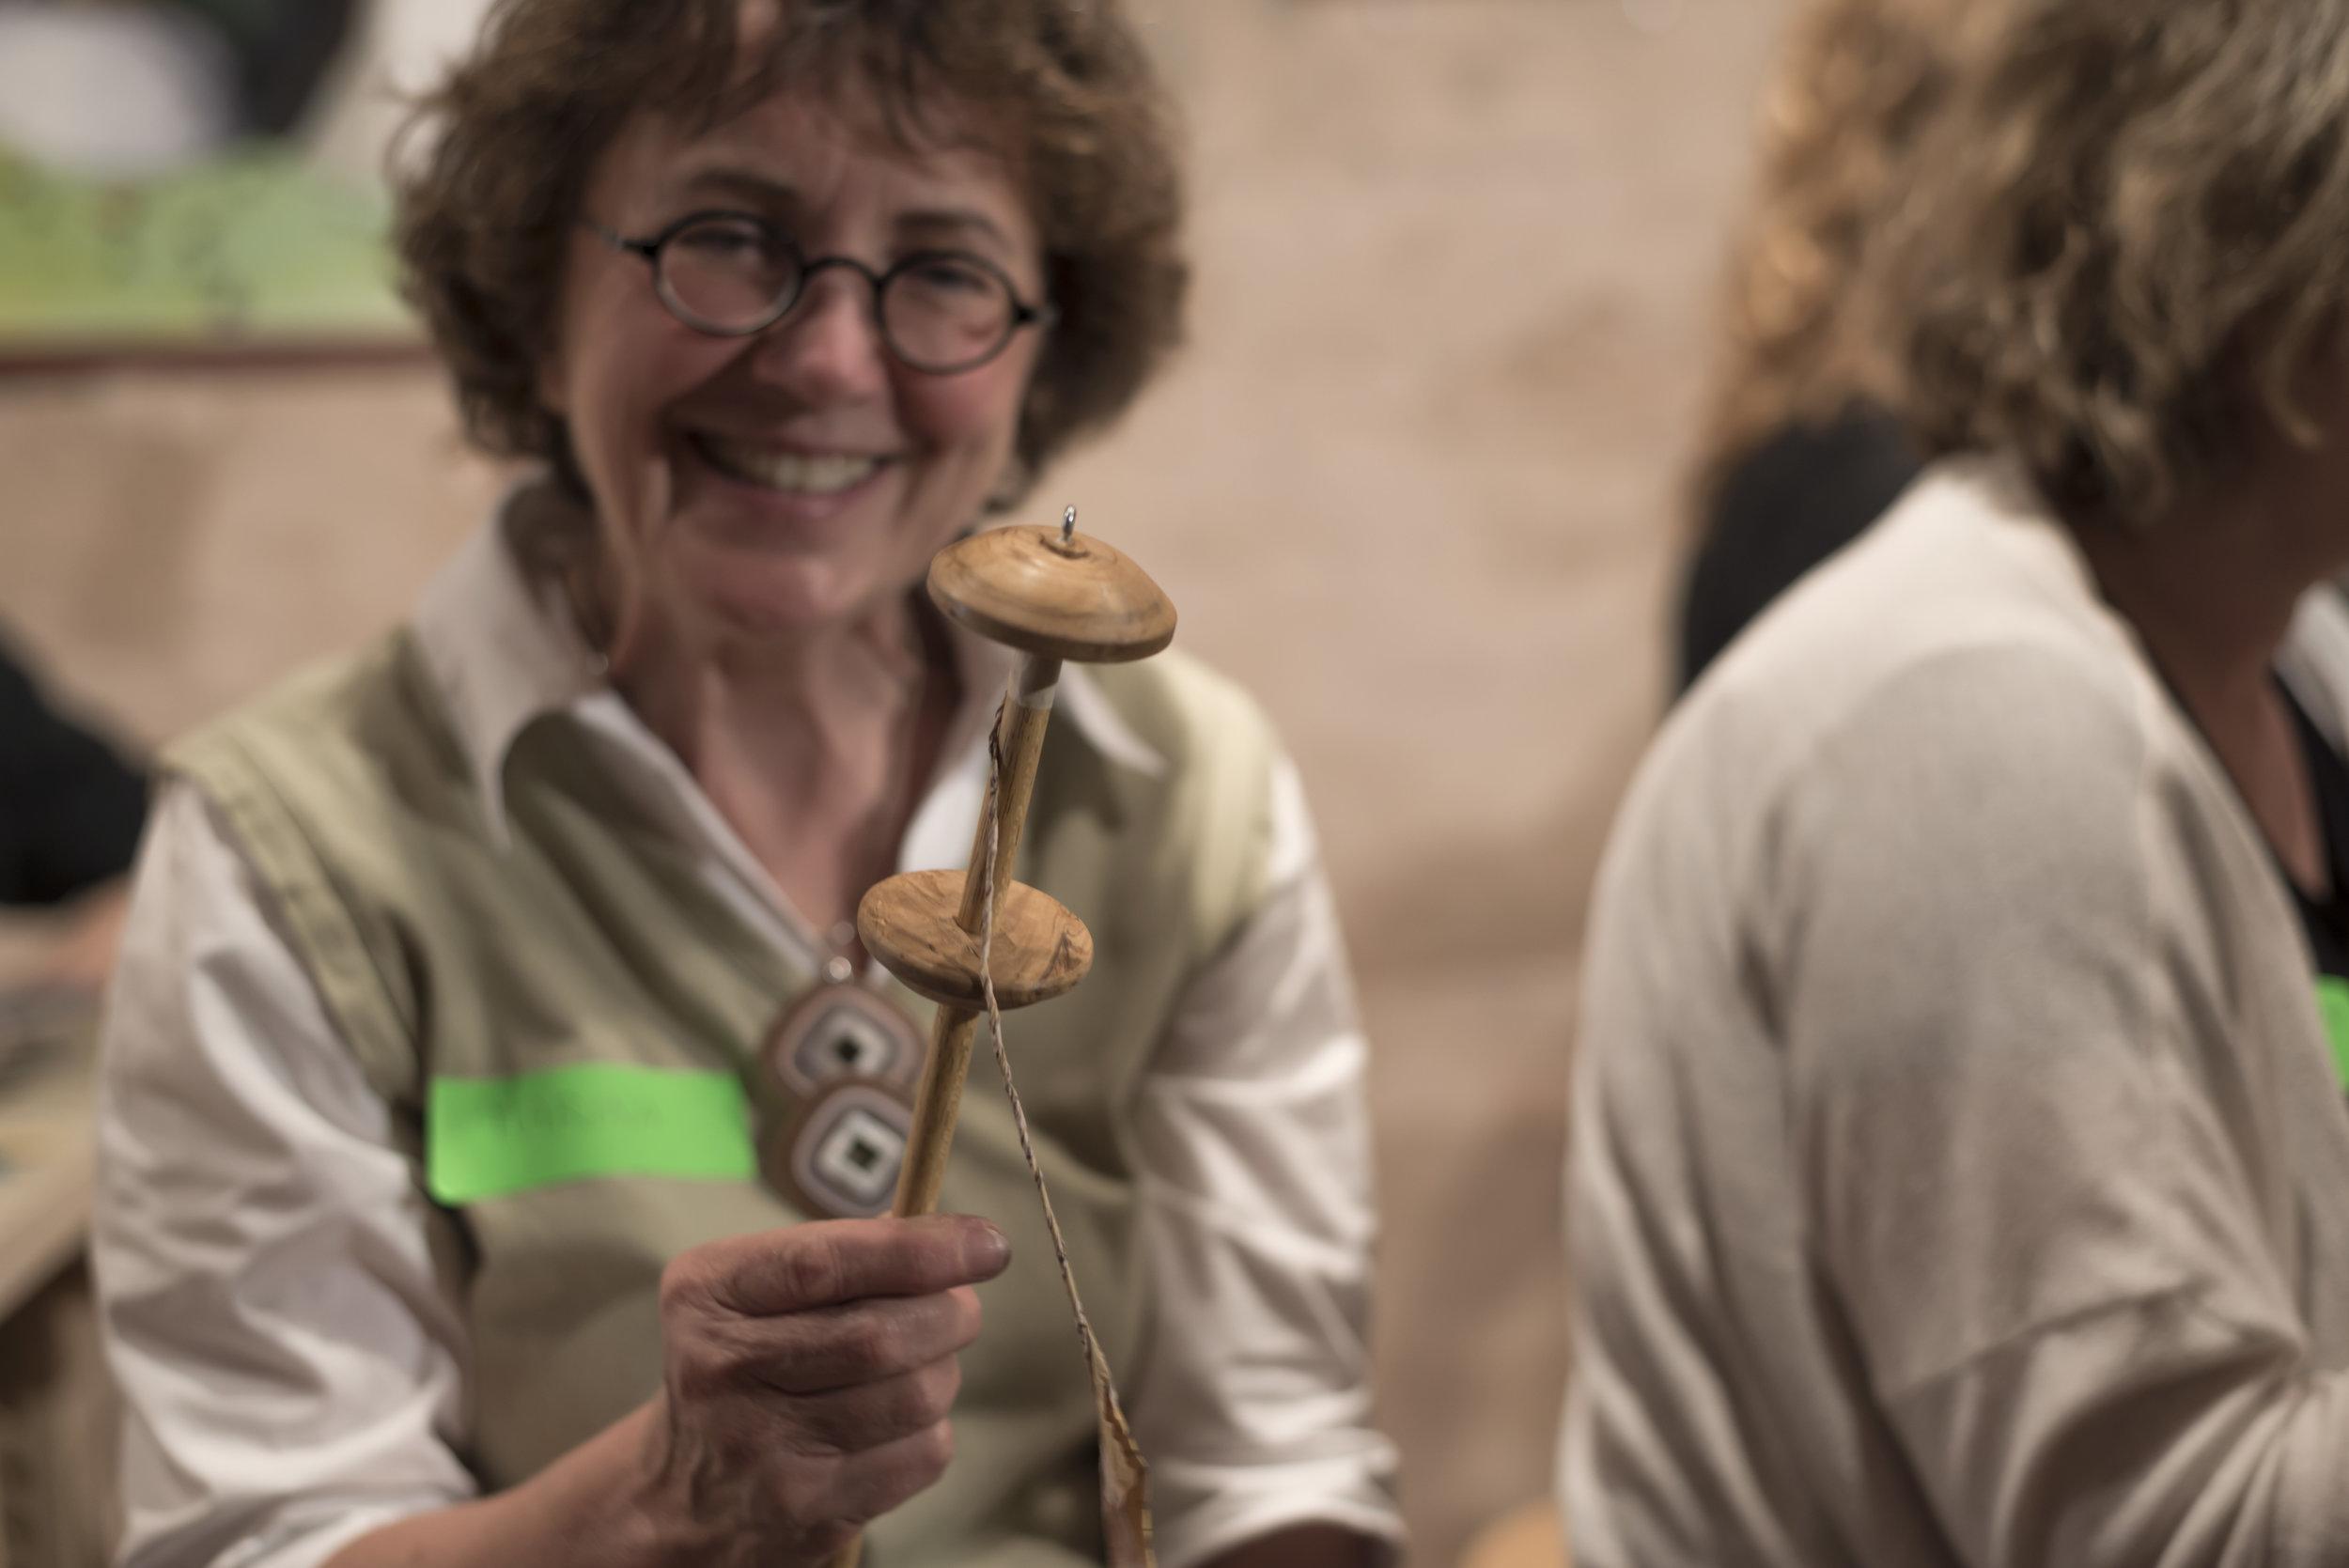 ws-museo-bijoux-cartalana-2.jpg